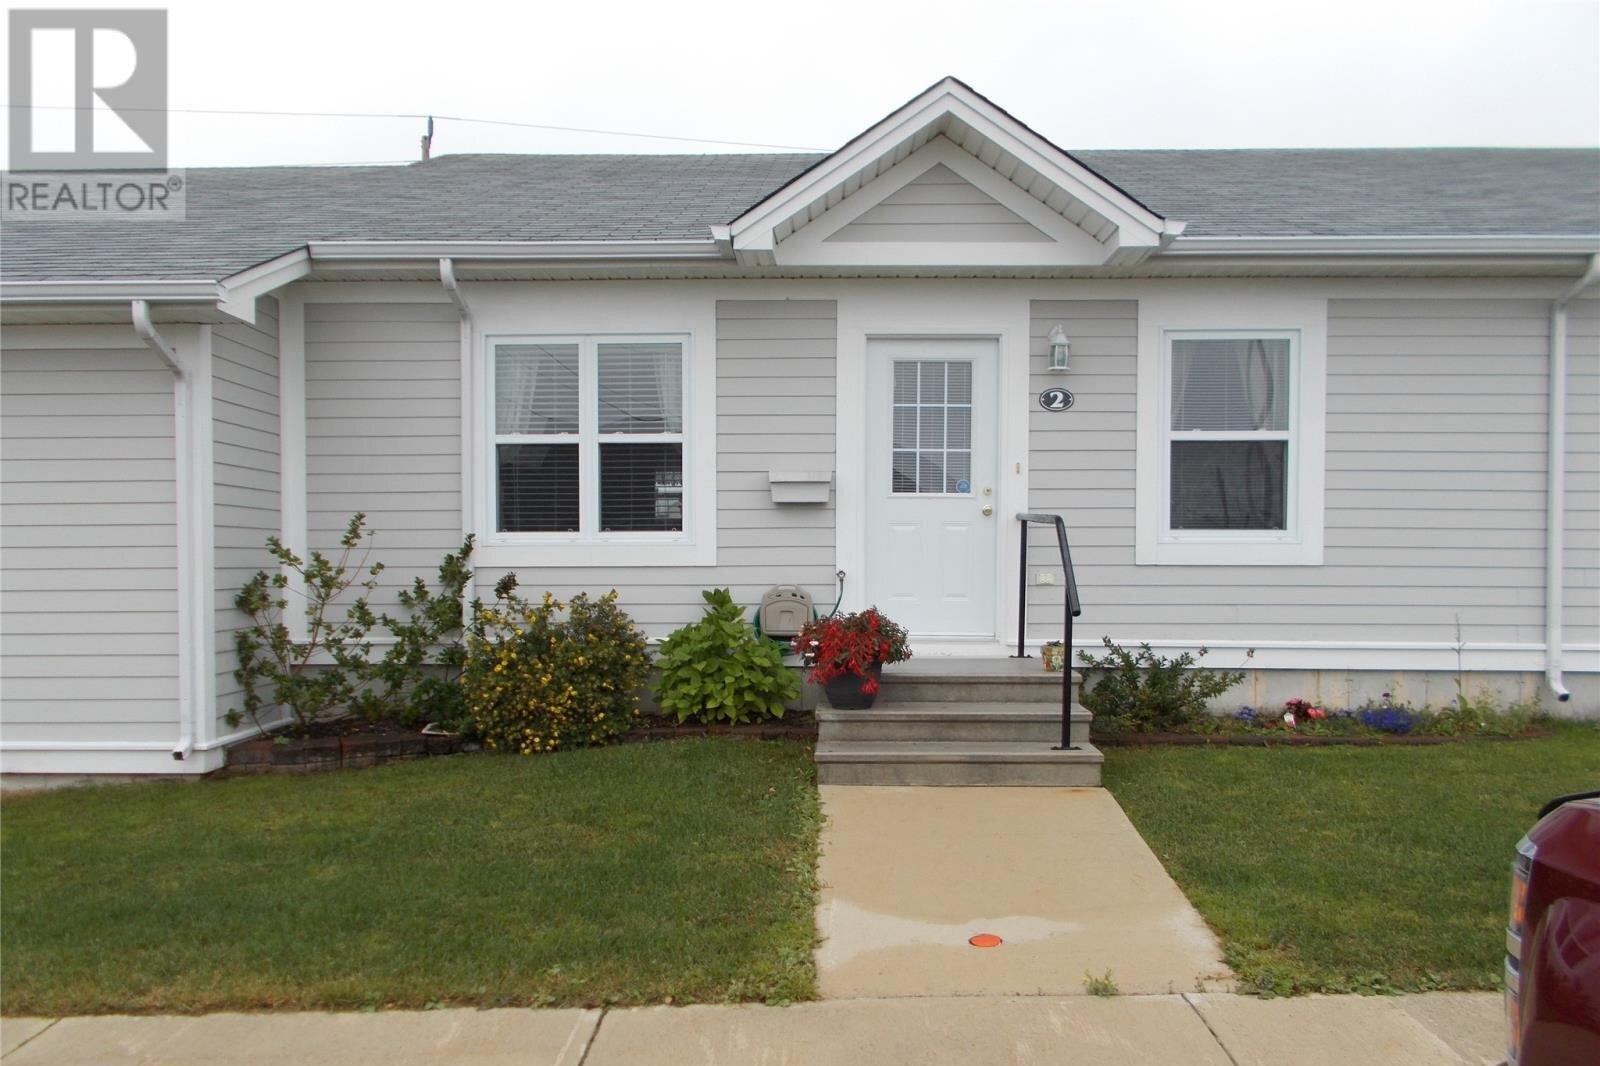 House for sale at 2 Appleblossom Ct St John's Newfoundland - MLS: 1224150